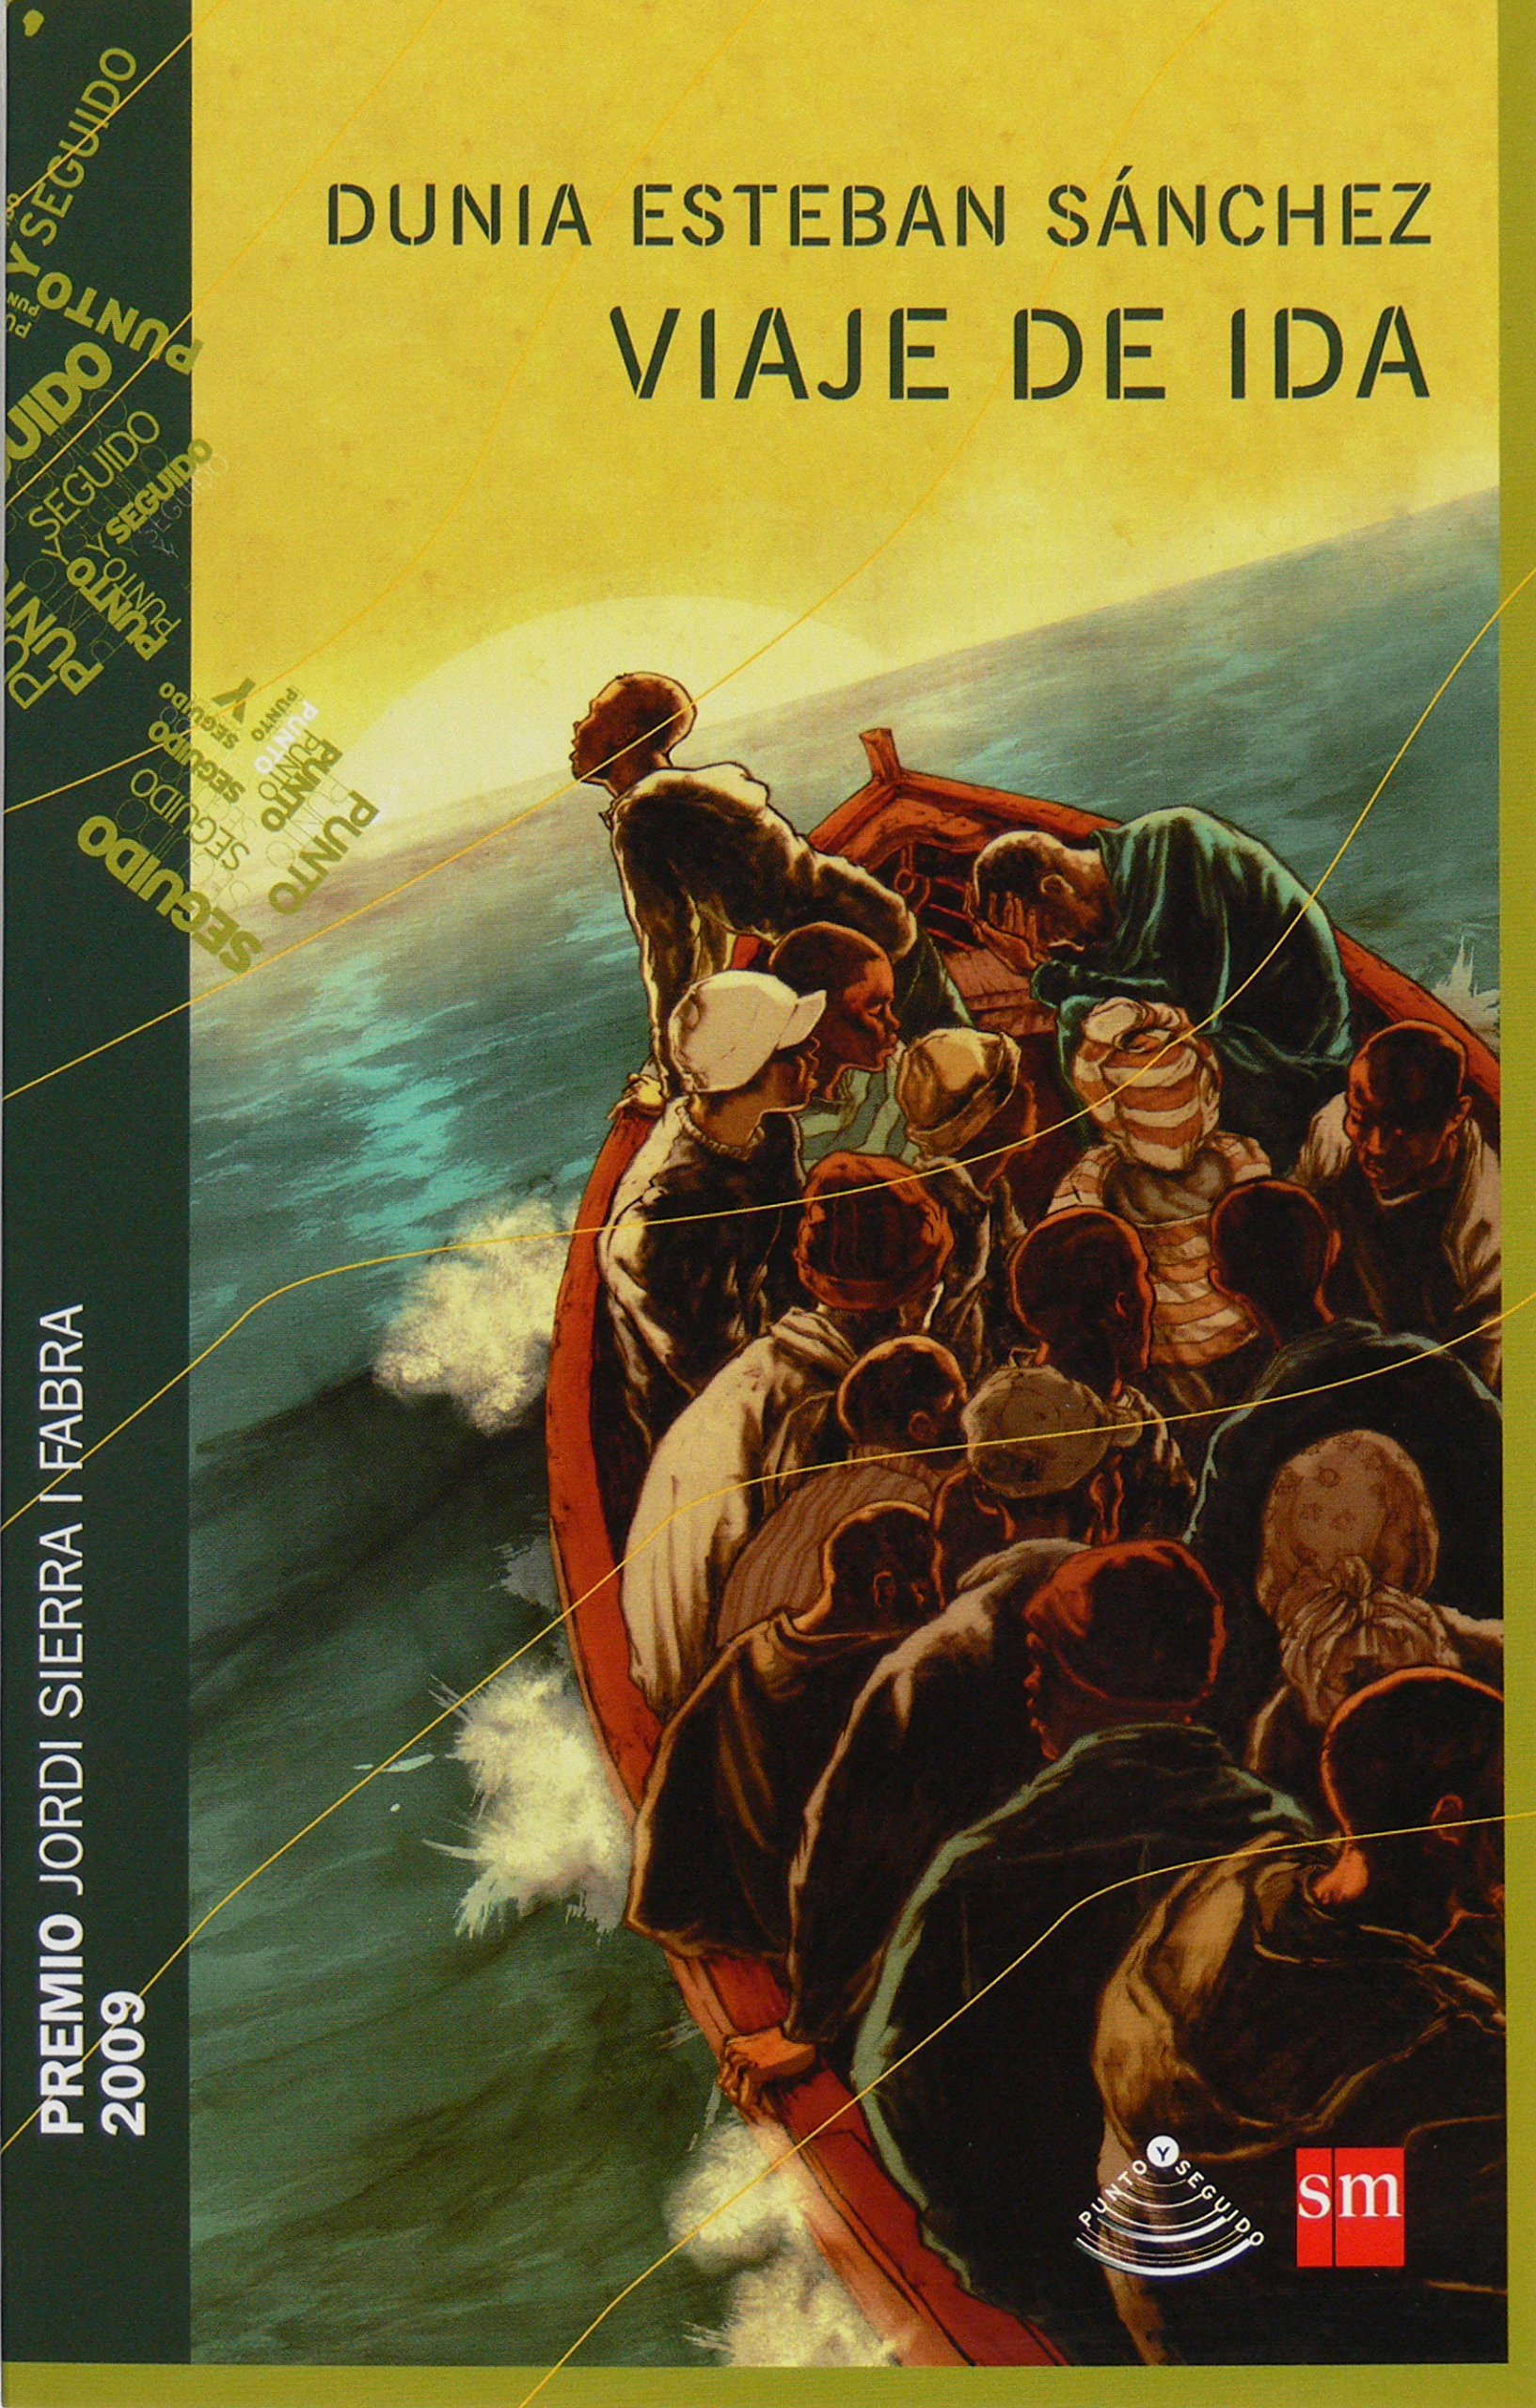 Viaje De Ida (spanish Edition): Dunia Esteban, Guillermo Martinez:  9788467535556: Amazon: Books